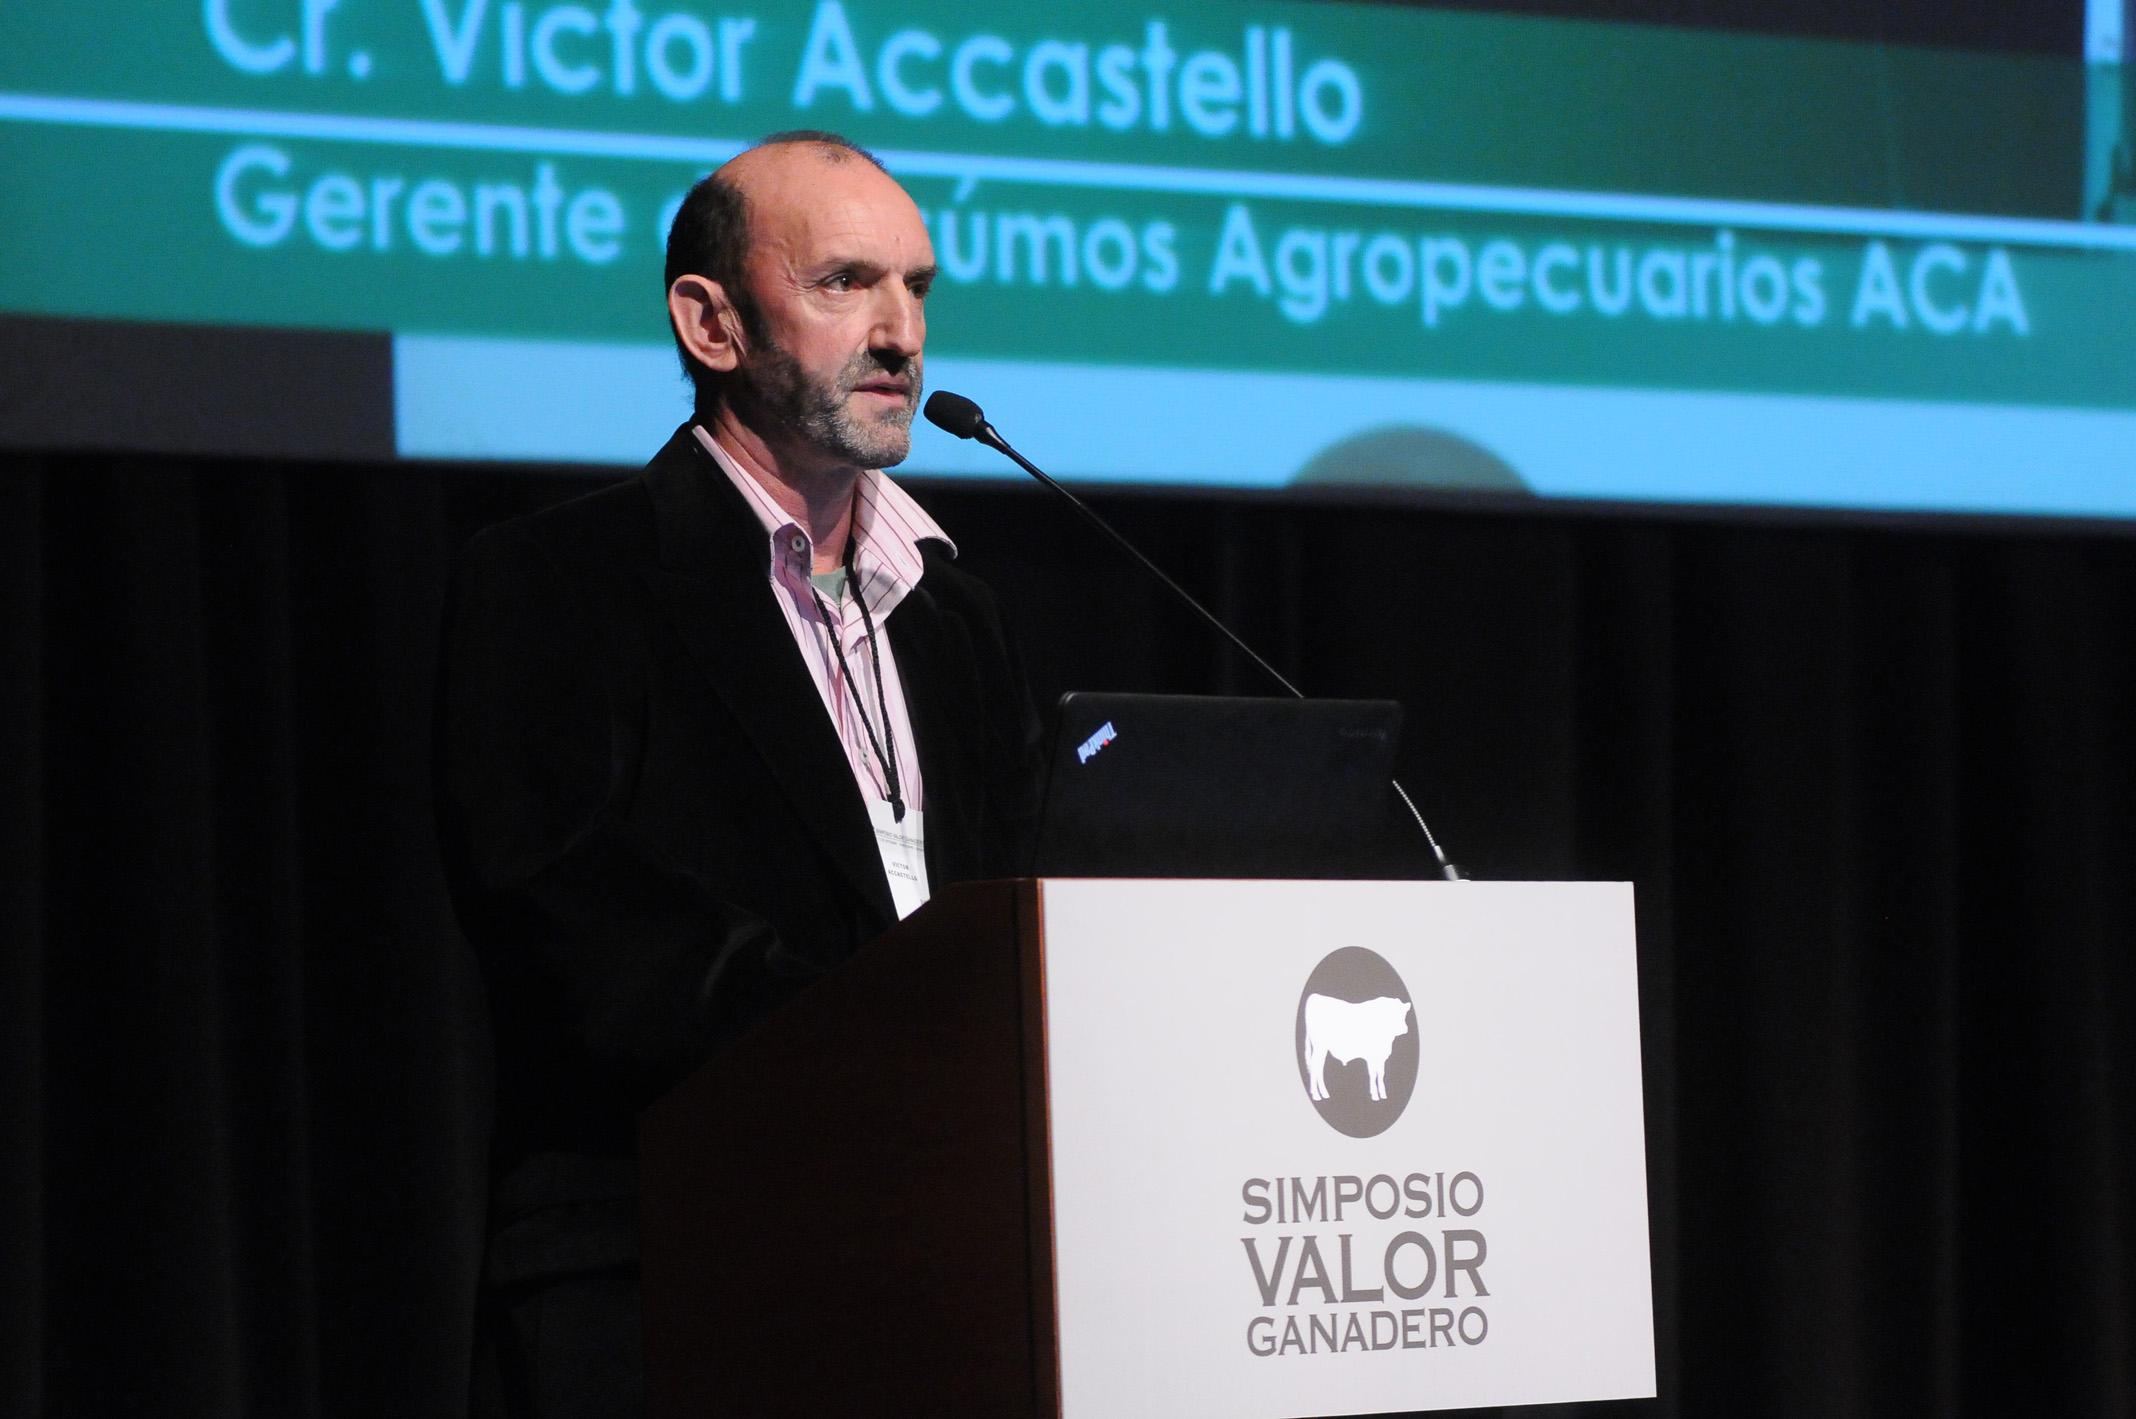 Víctor Accastello